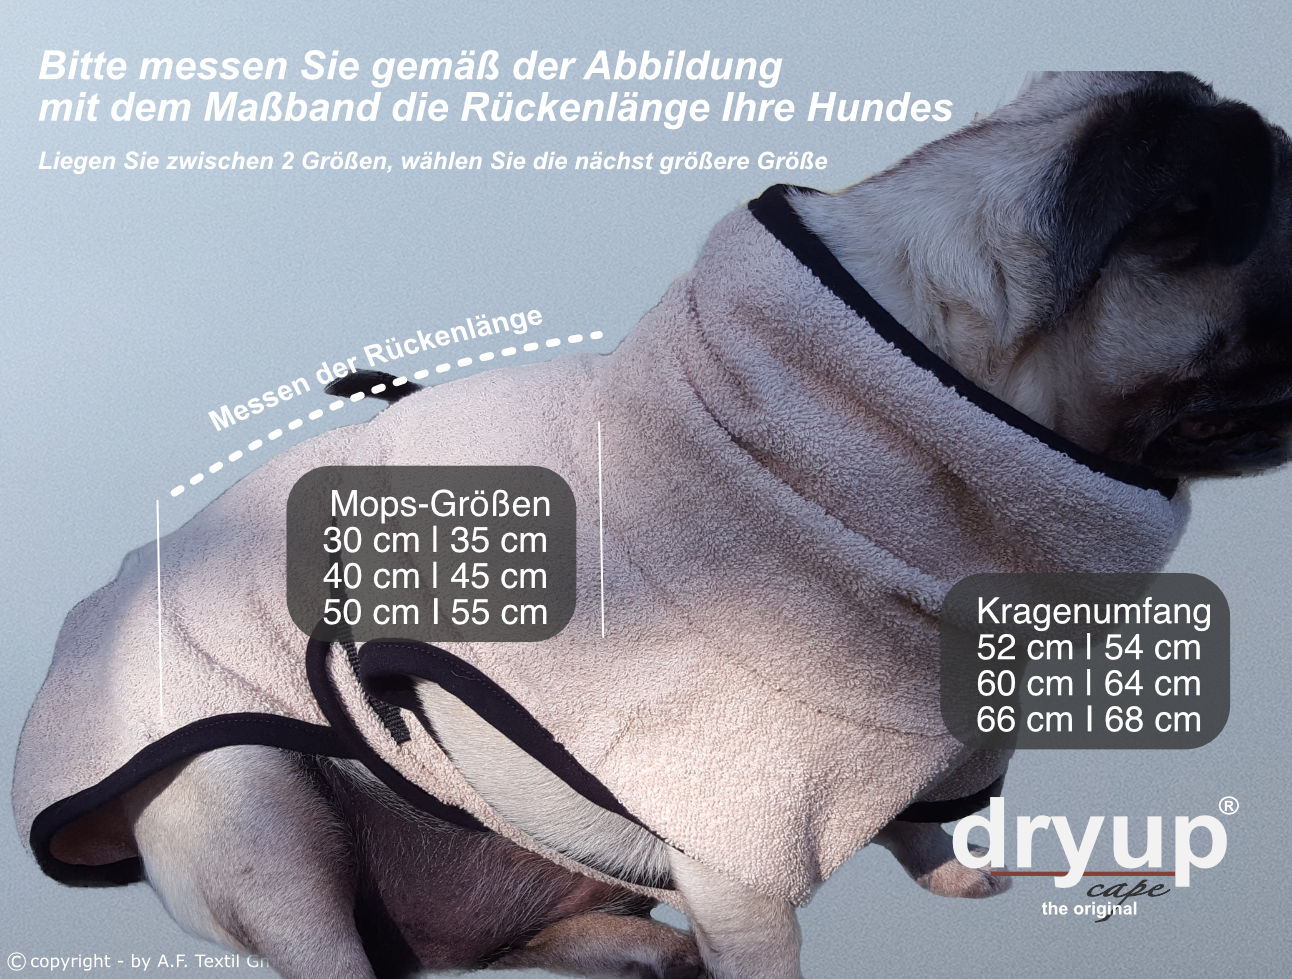 sizing-dryup-mopsZz4XaAbarag9U